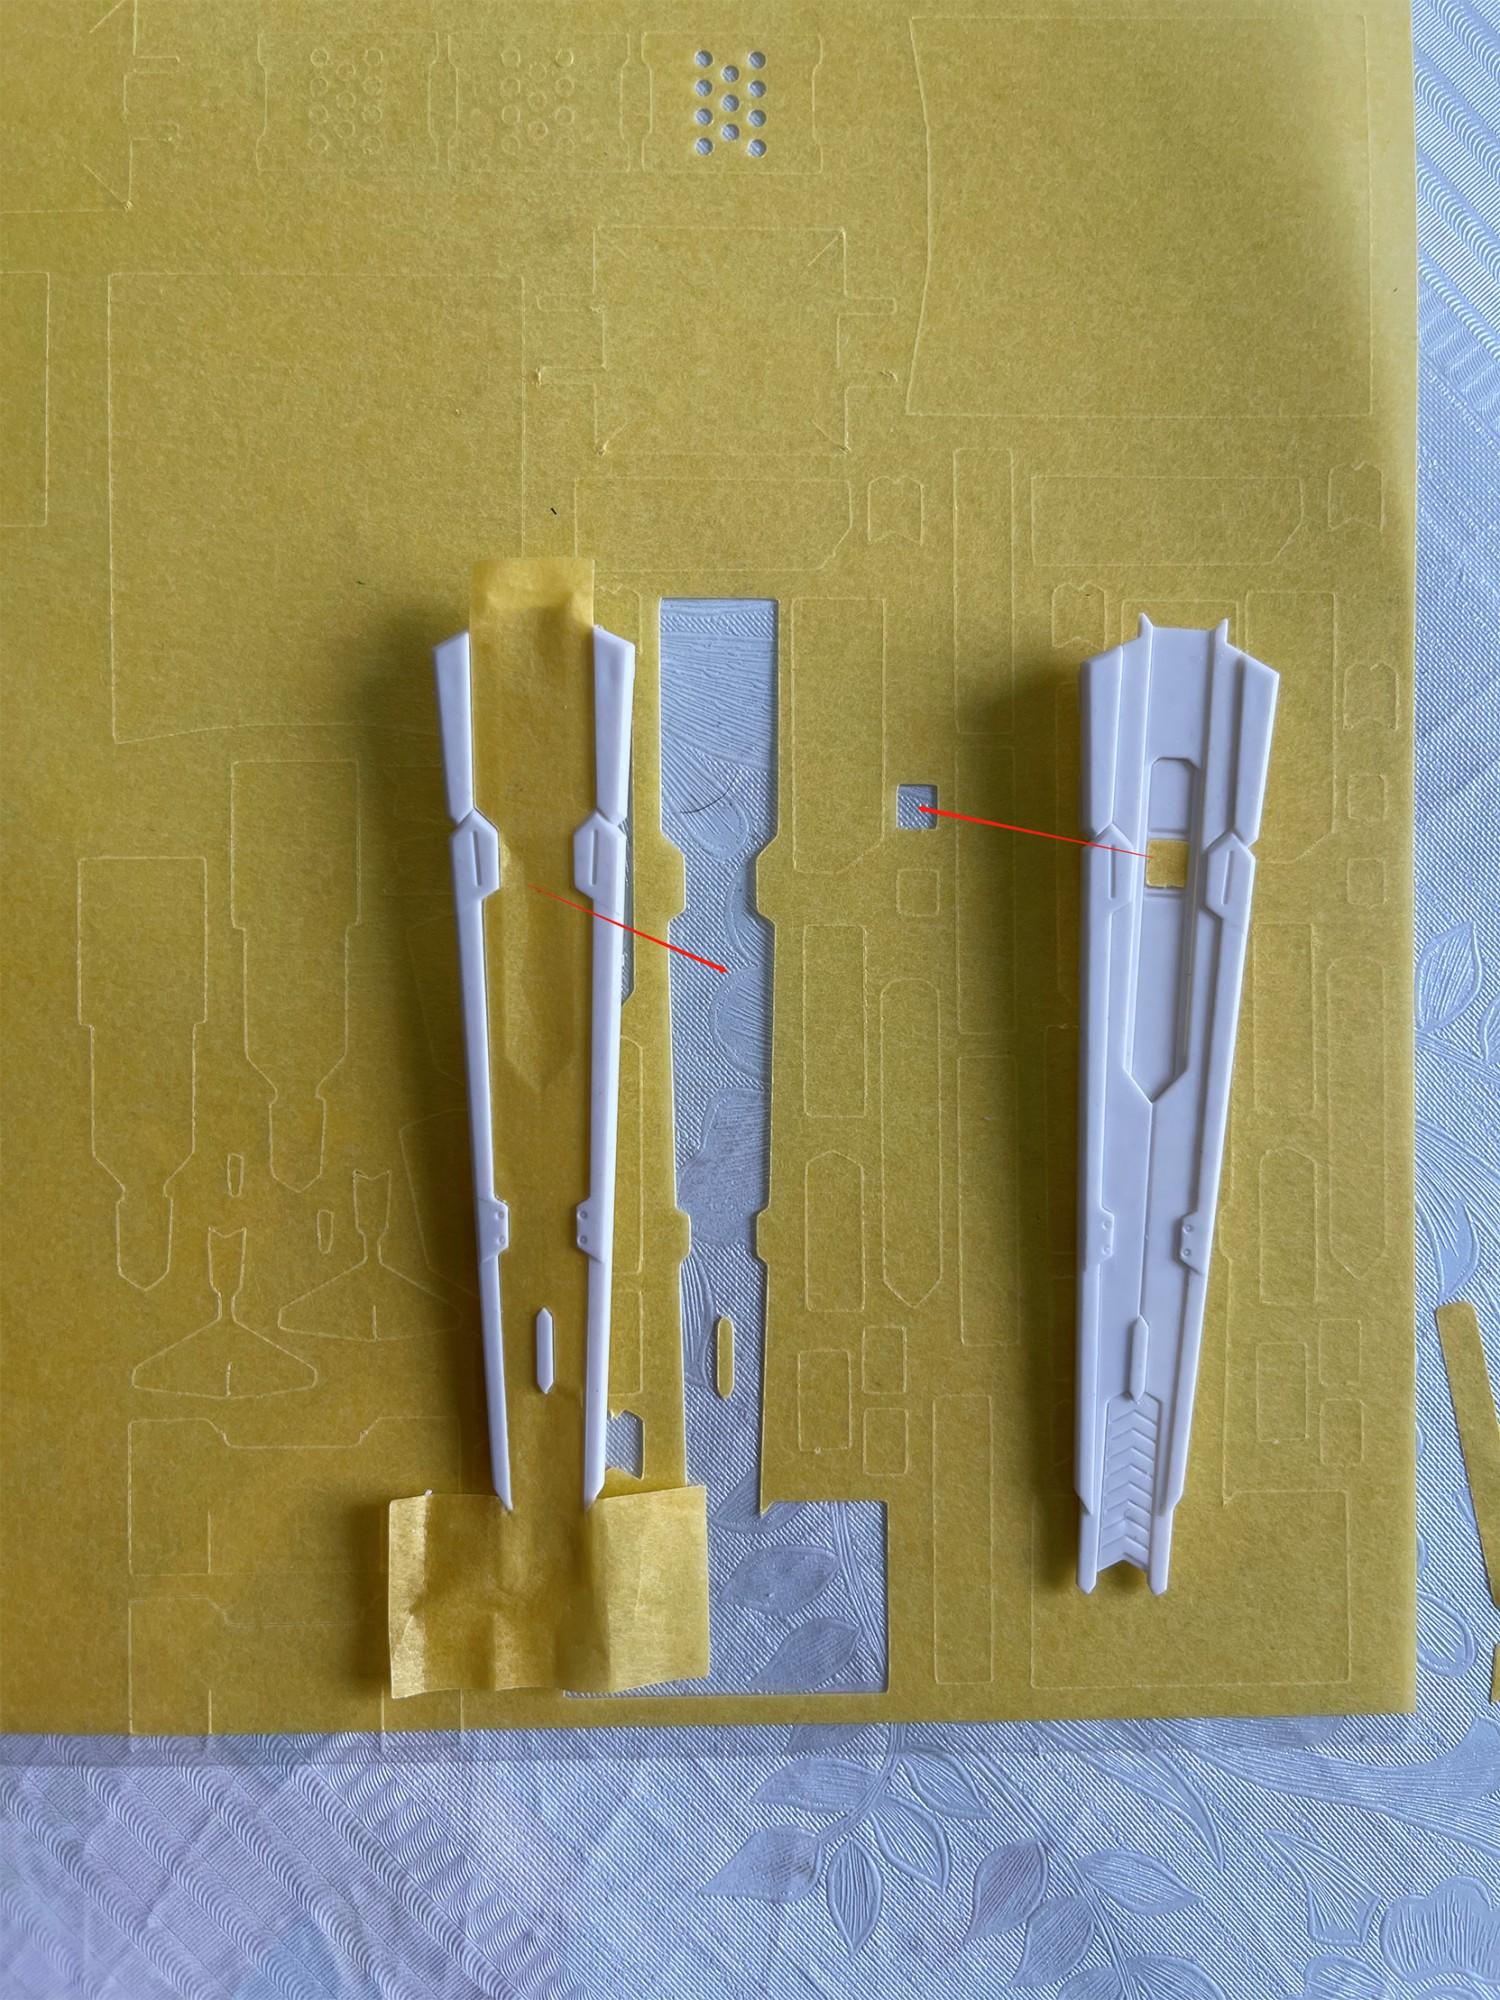 G825_YGCP_mg_yujiaoland_masking_tape_nu_022.jpg